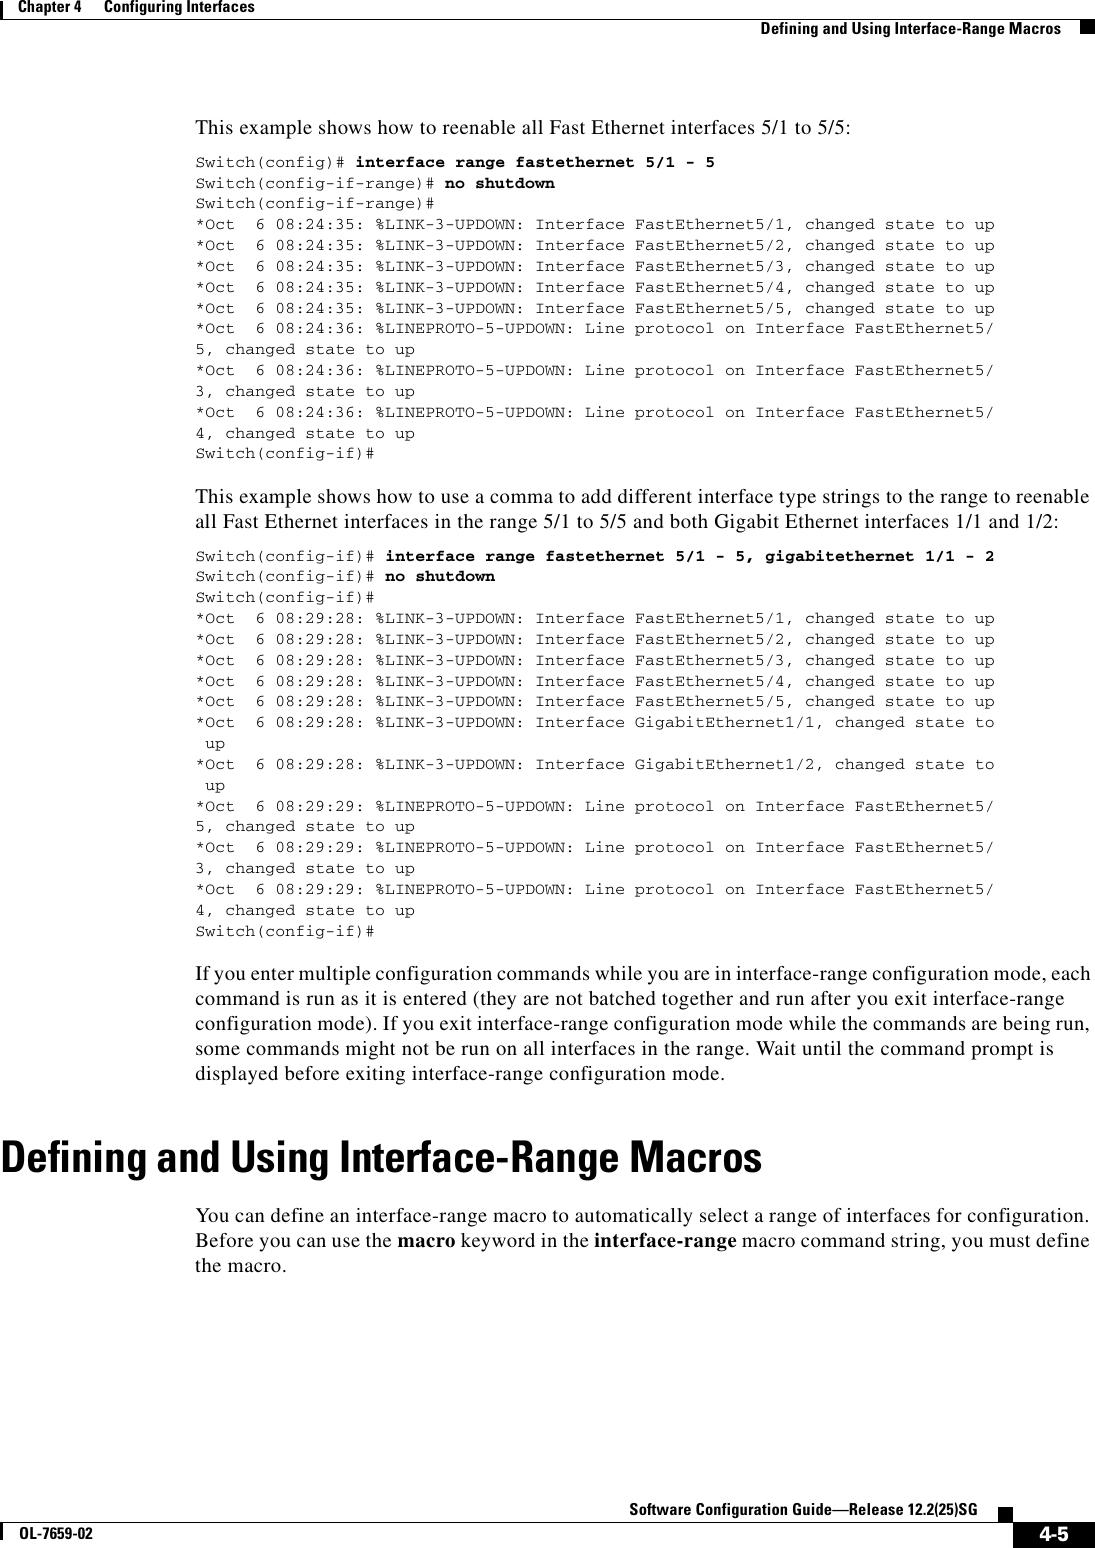 Cisco 9800 Wlc Deployment Guide